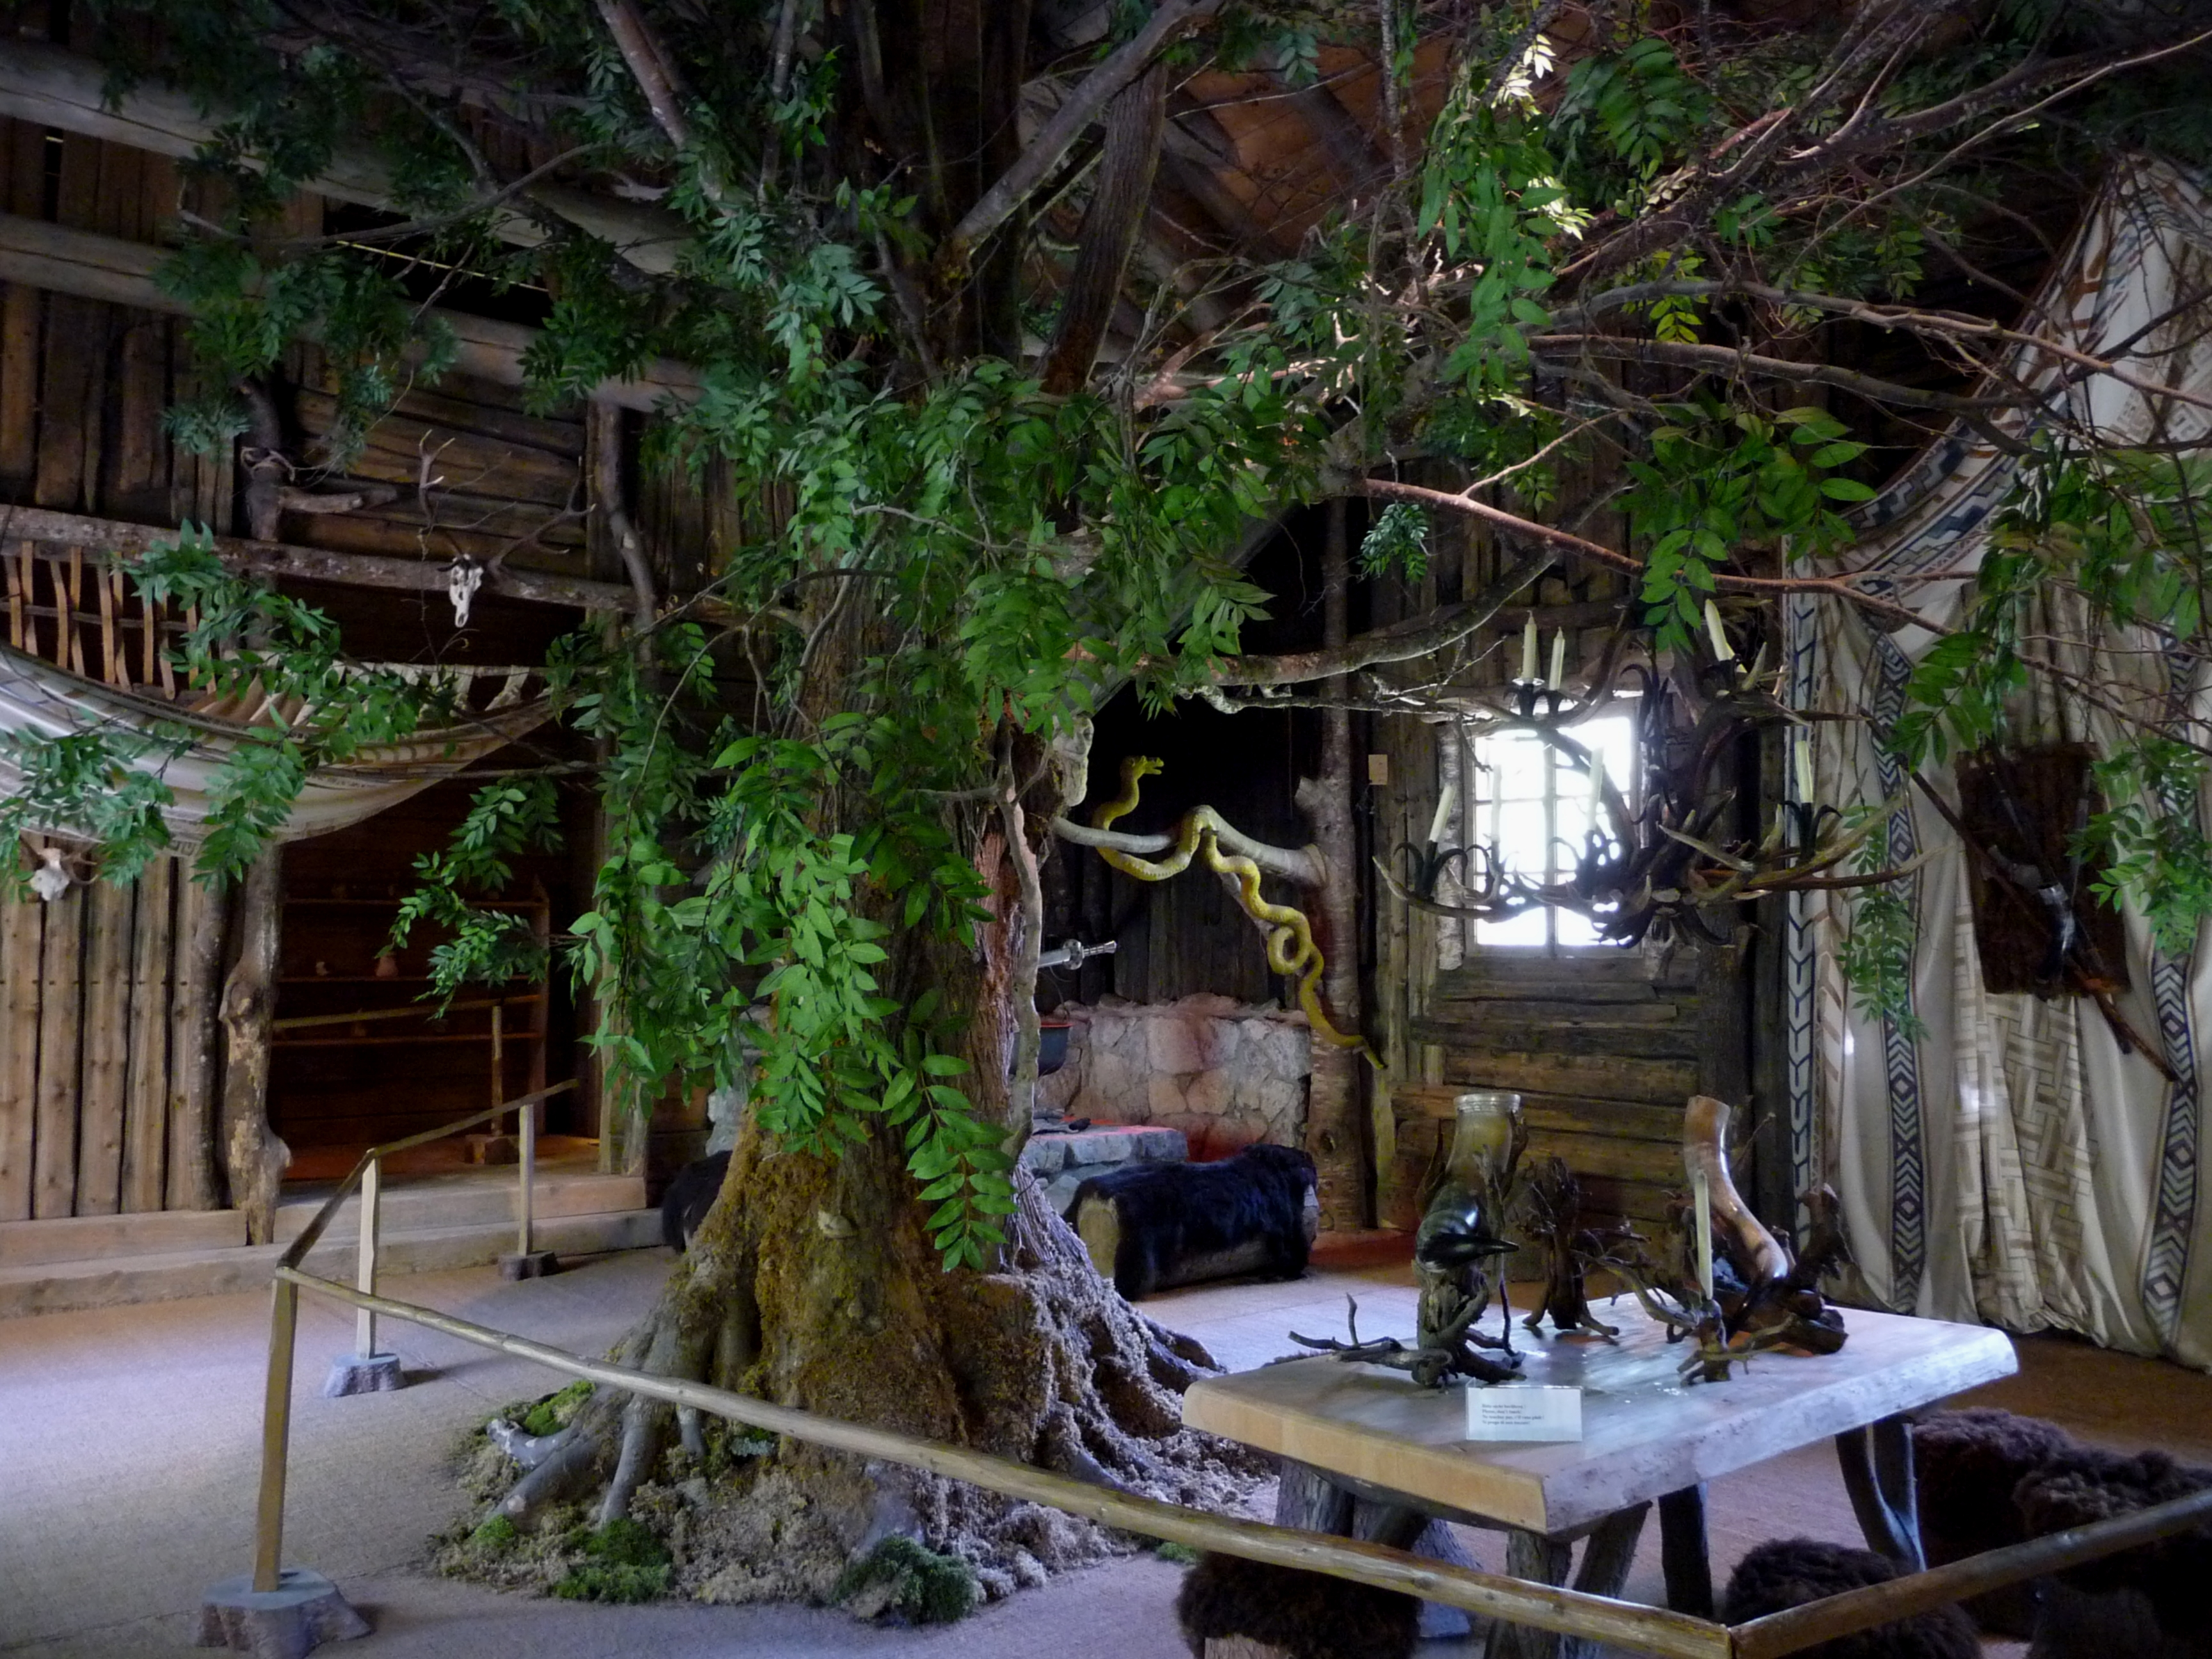 File Linderhof Palace Hunding S Hut Interior 2011 Jpg Wikimedia Commons